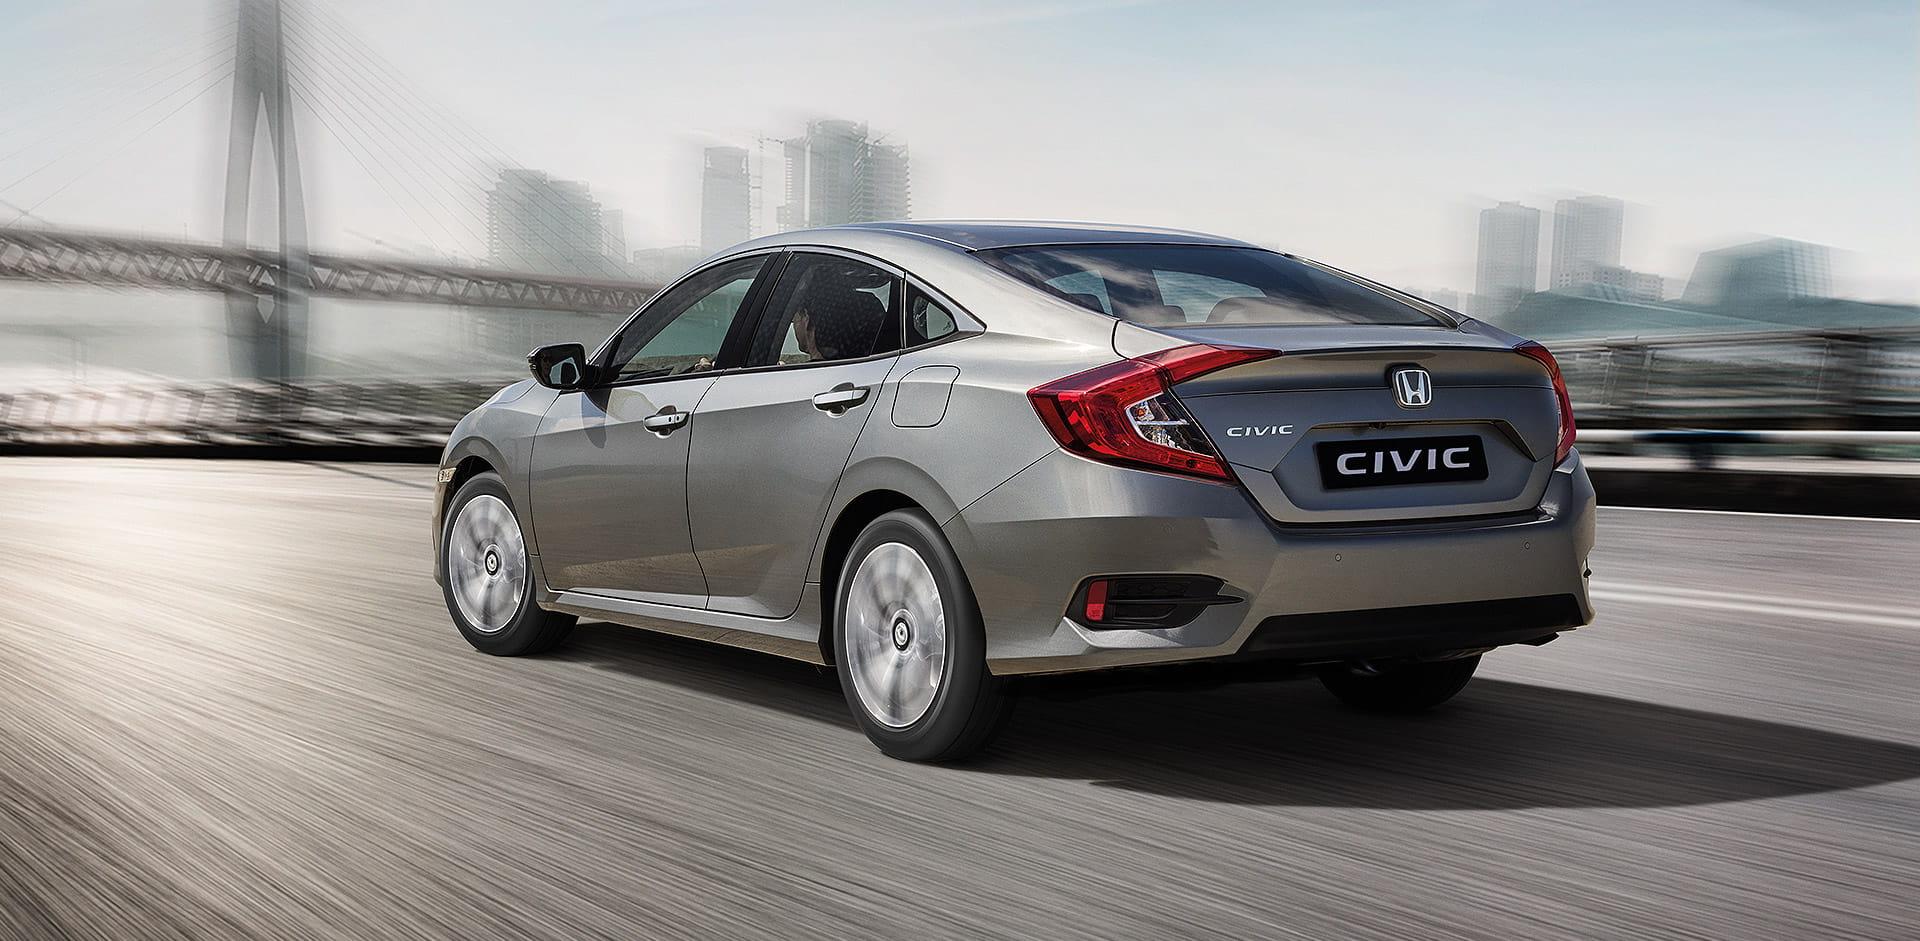 Civic 2020 Simply Stunning Honda Egypt